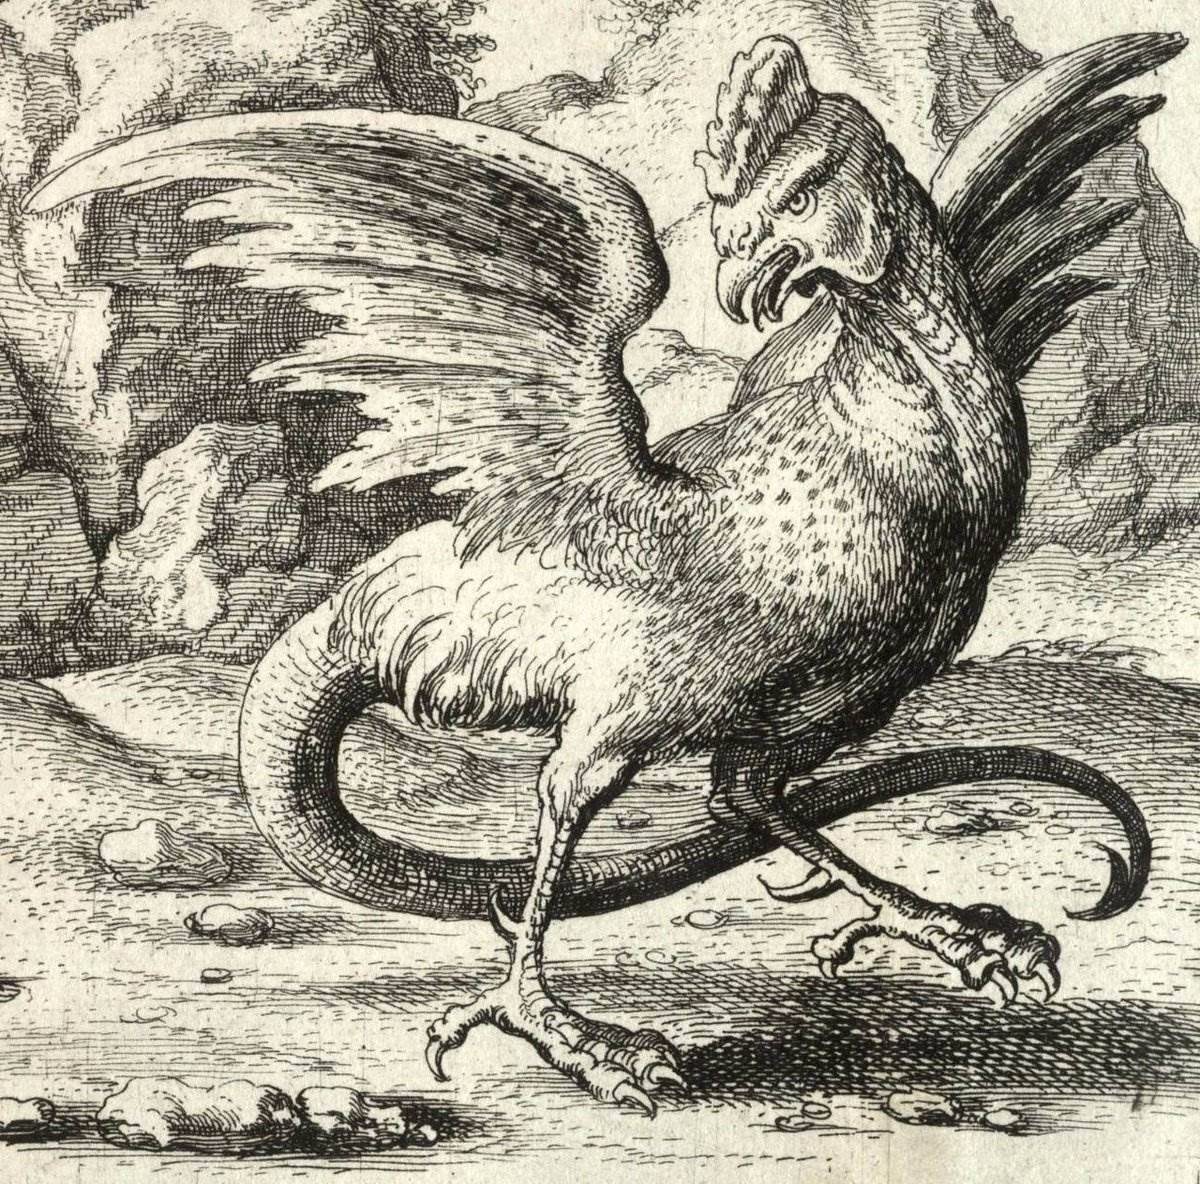 Кокатрикс - беастиарий  - каталог статей - ведьмак бестиарий